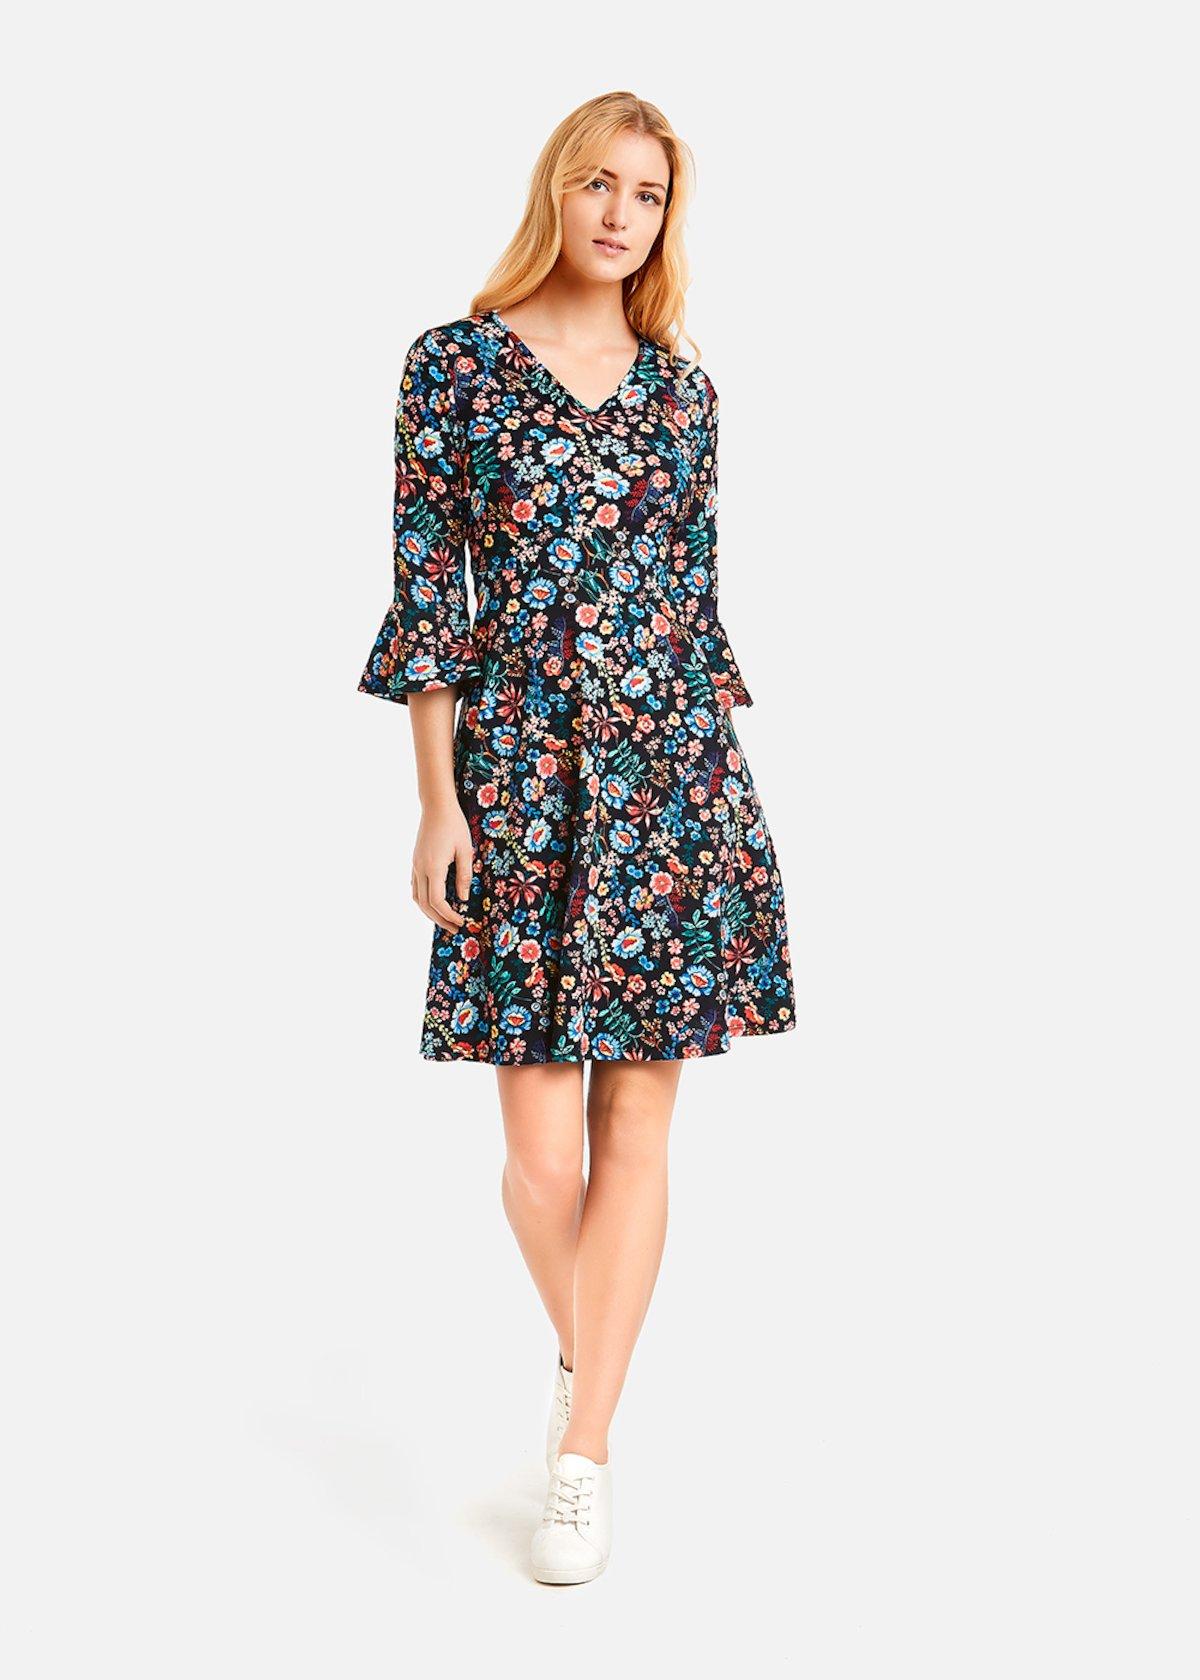 Alyon floral fantasy dress - Dark Blue Fantasia